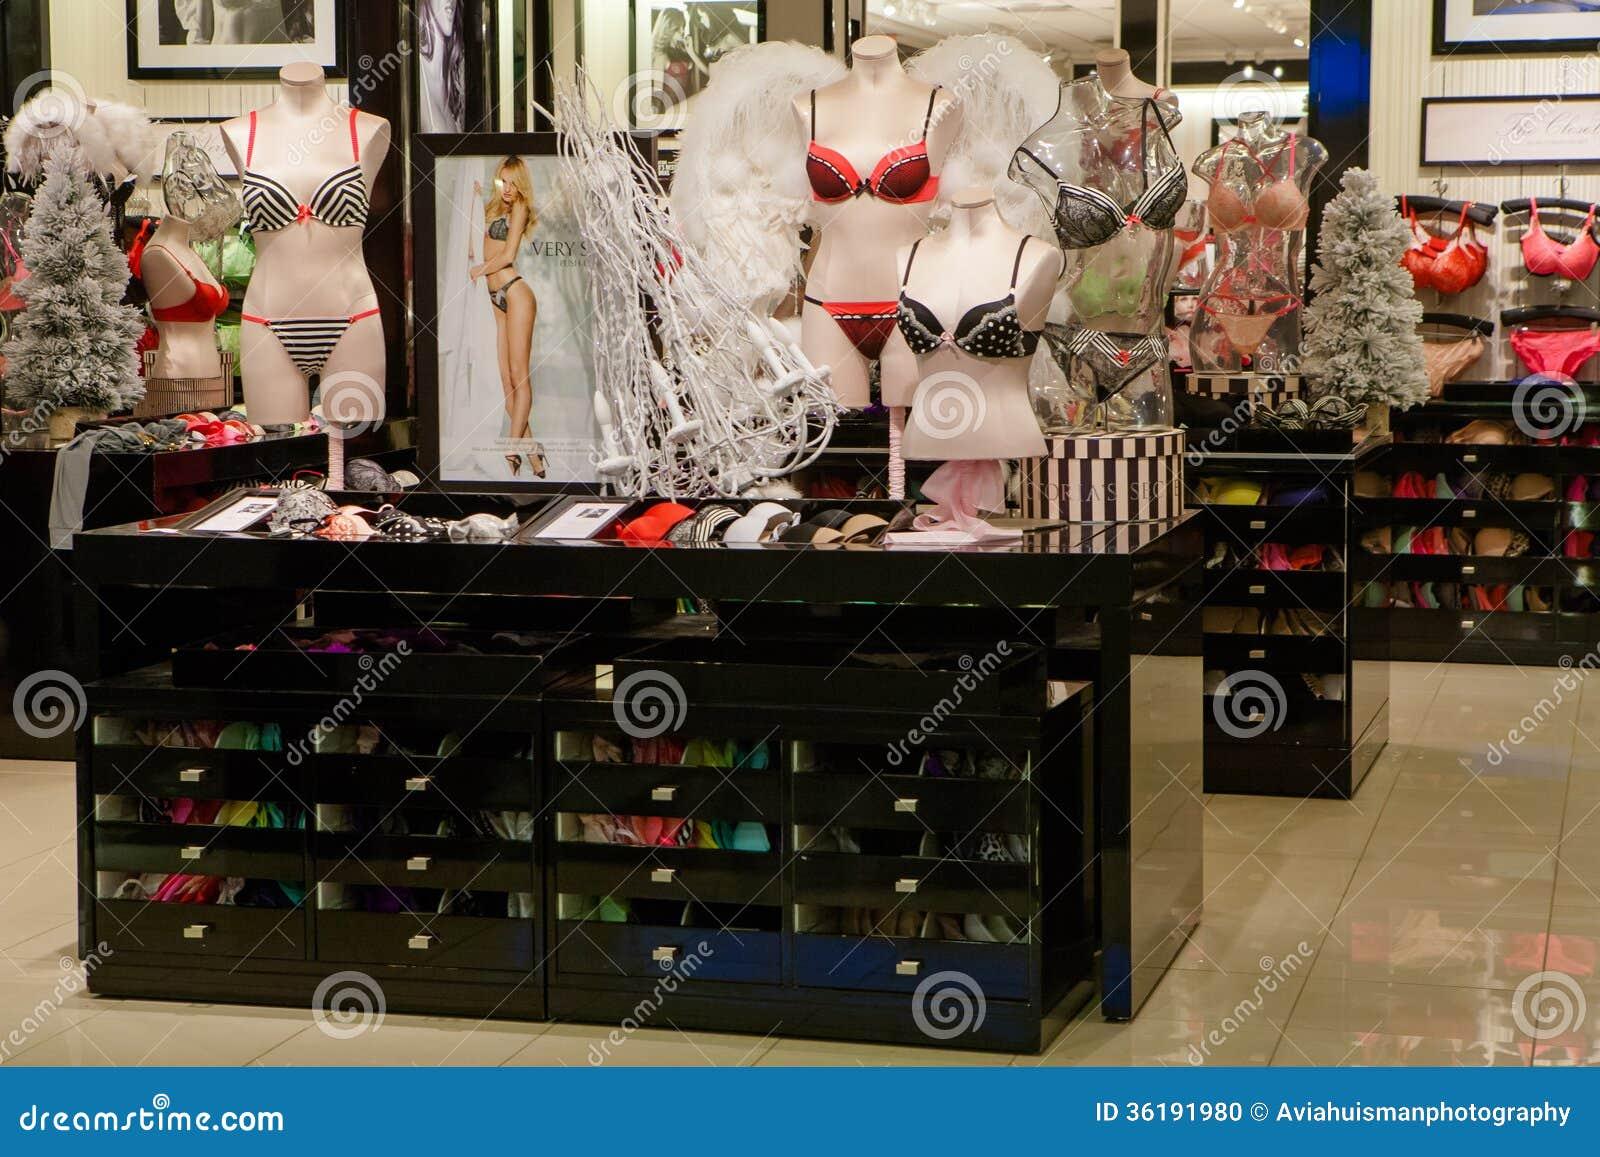 Women Lingerie Underwear Store Editorial Image - Image: 36897705